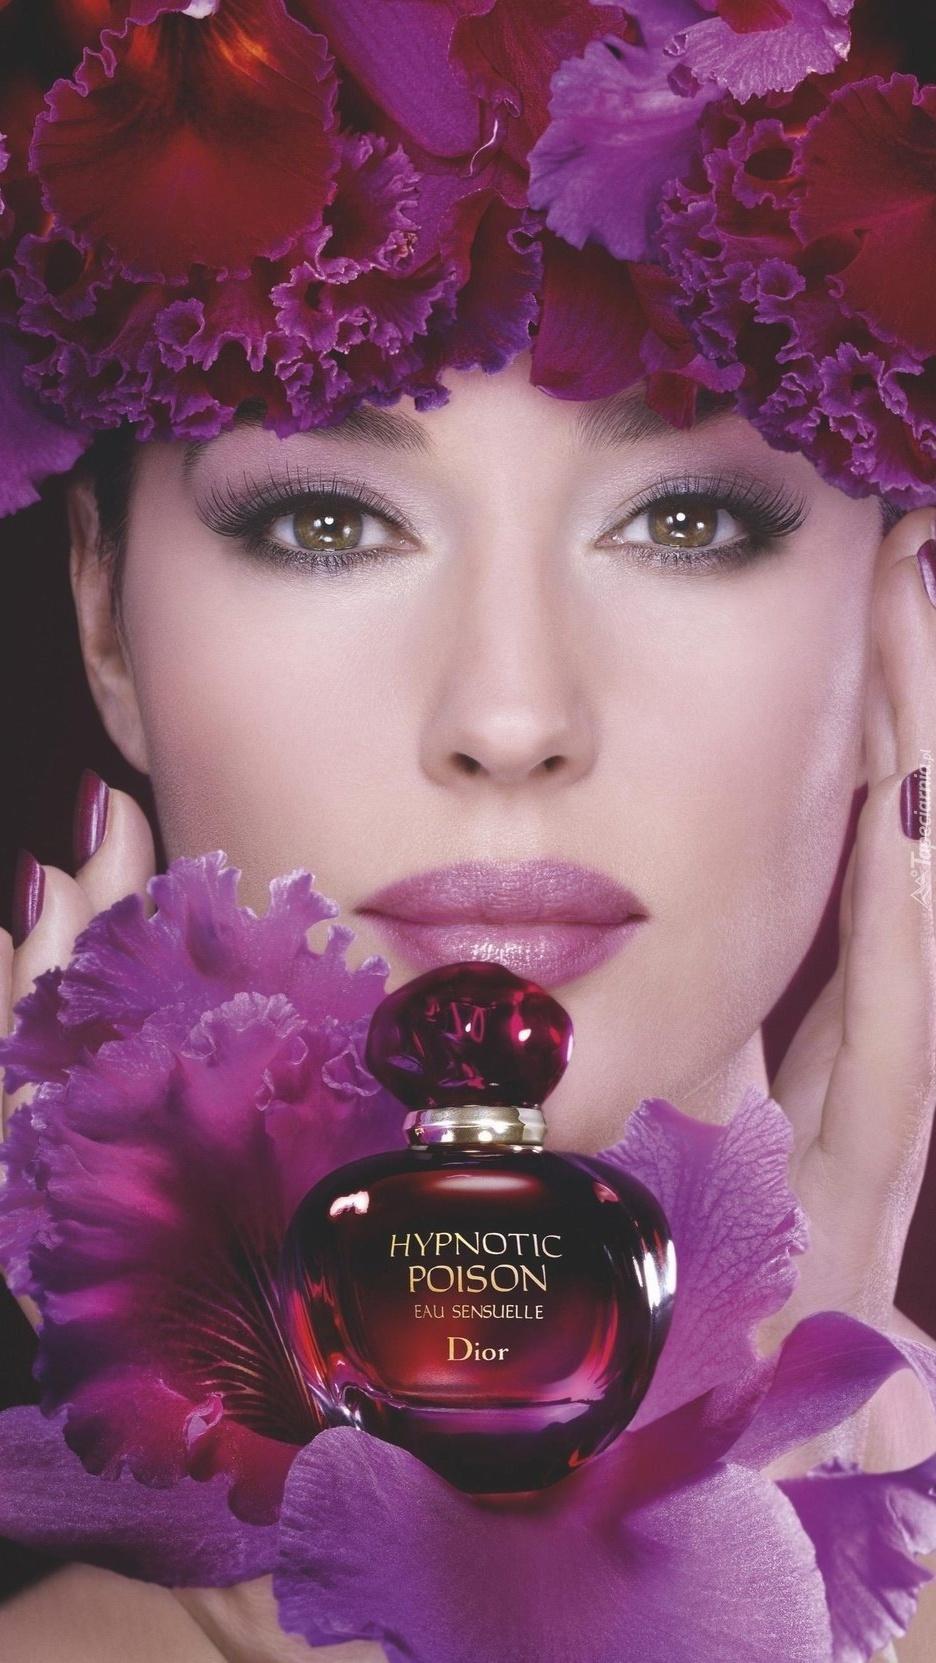 Monica Belluci reklamująca perfumy Diora